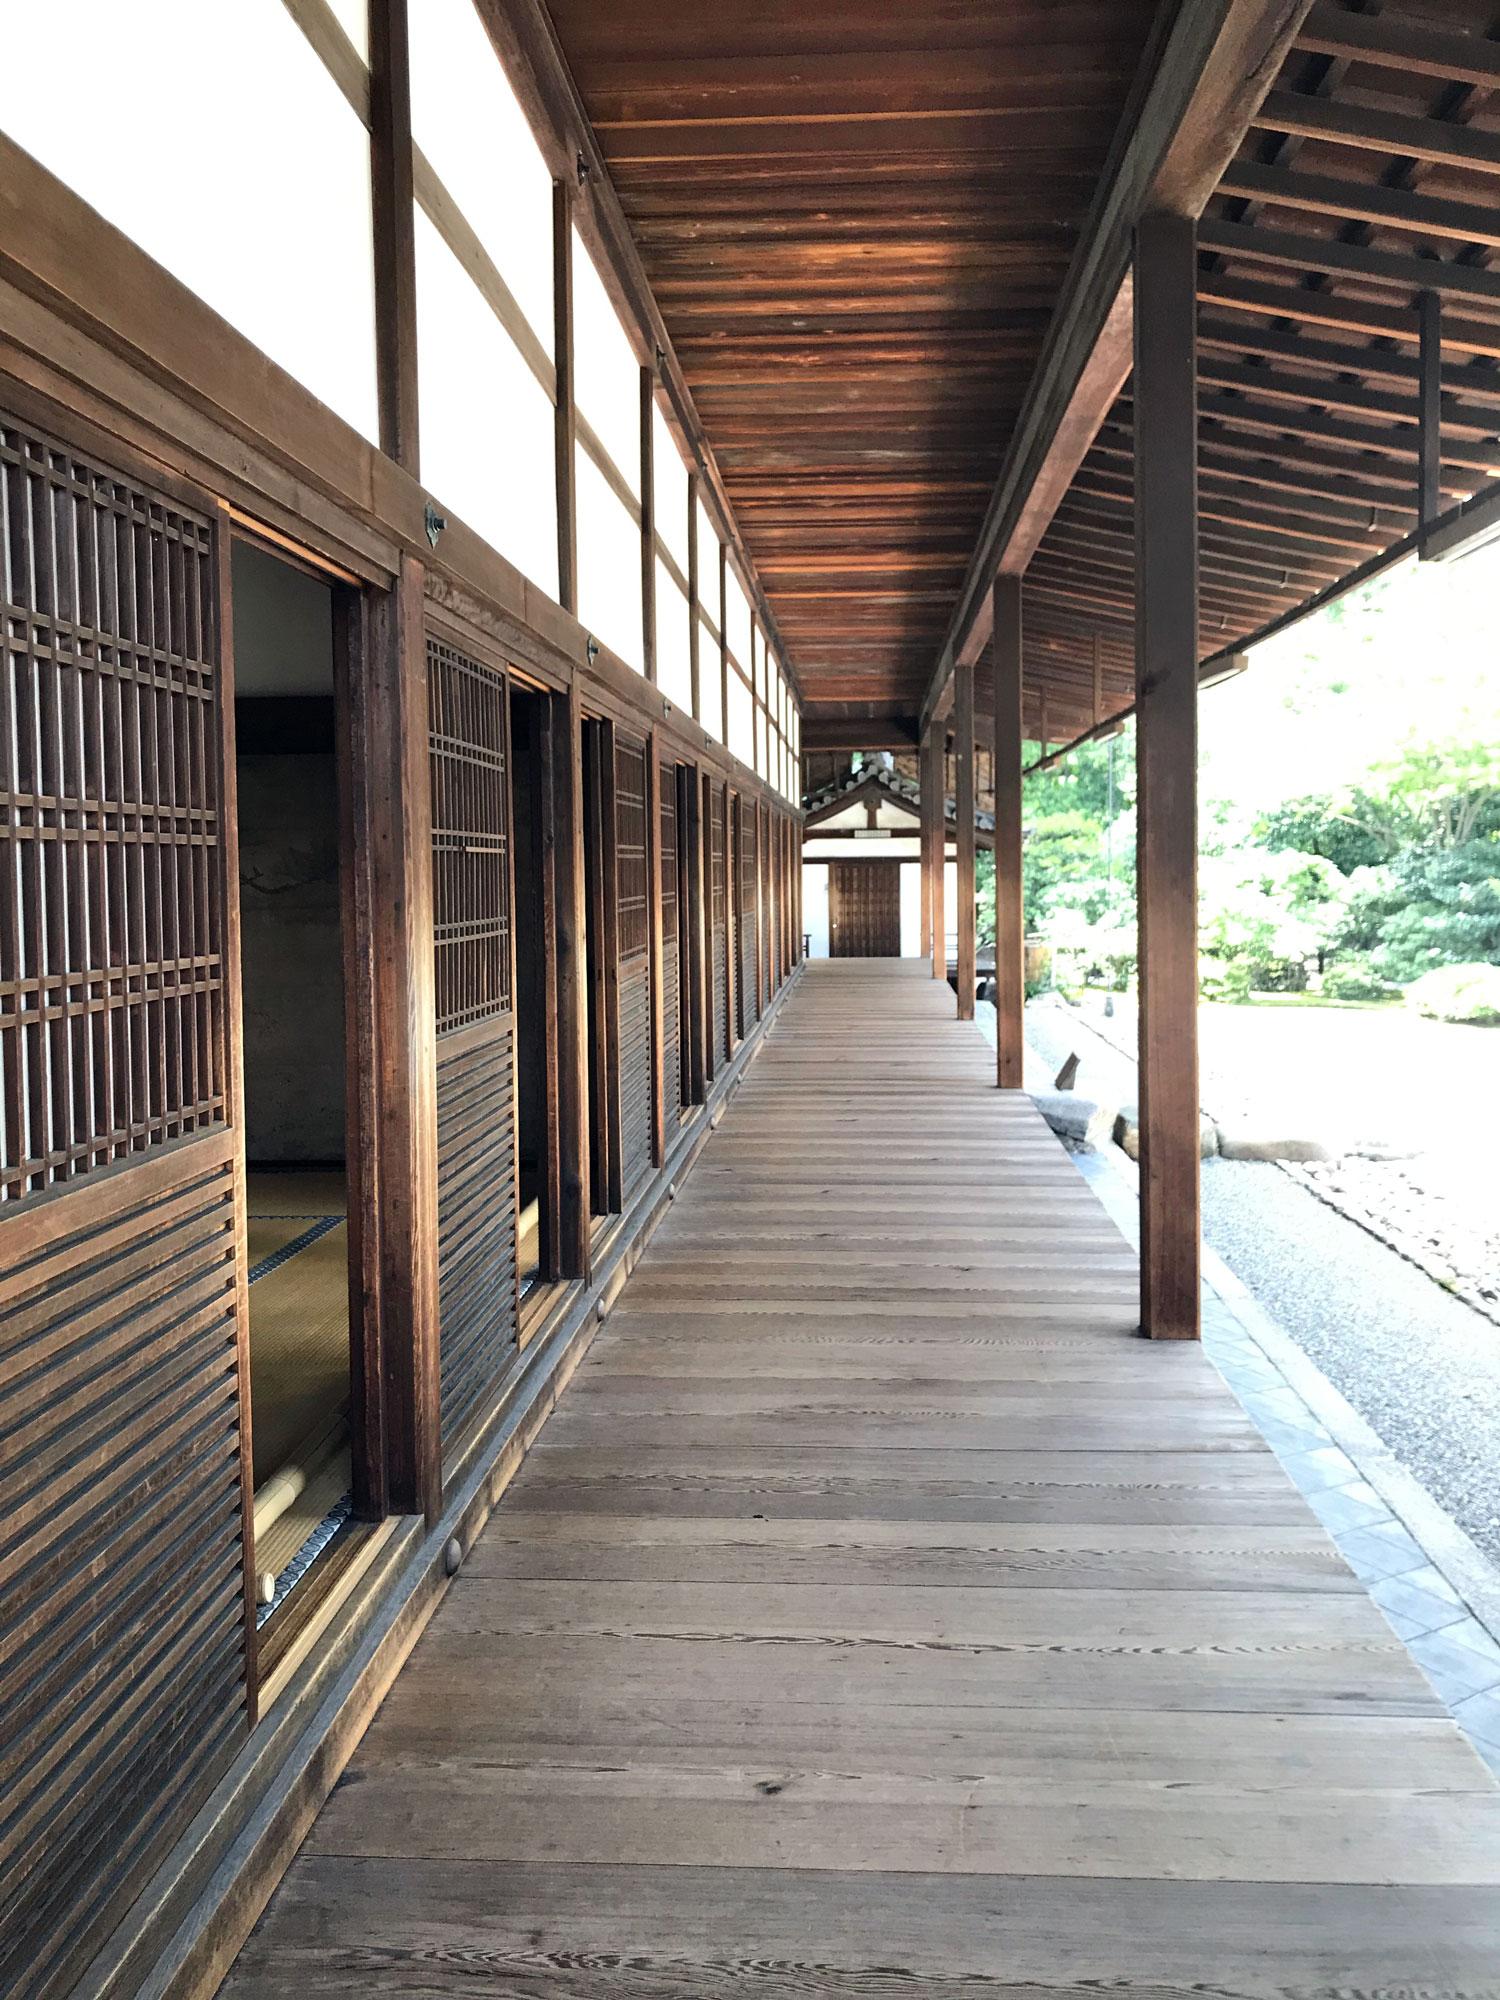 Kennin-ji-ZEN-Tempel-04b.jpg